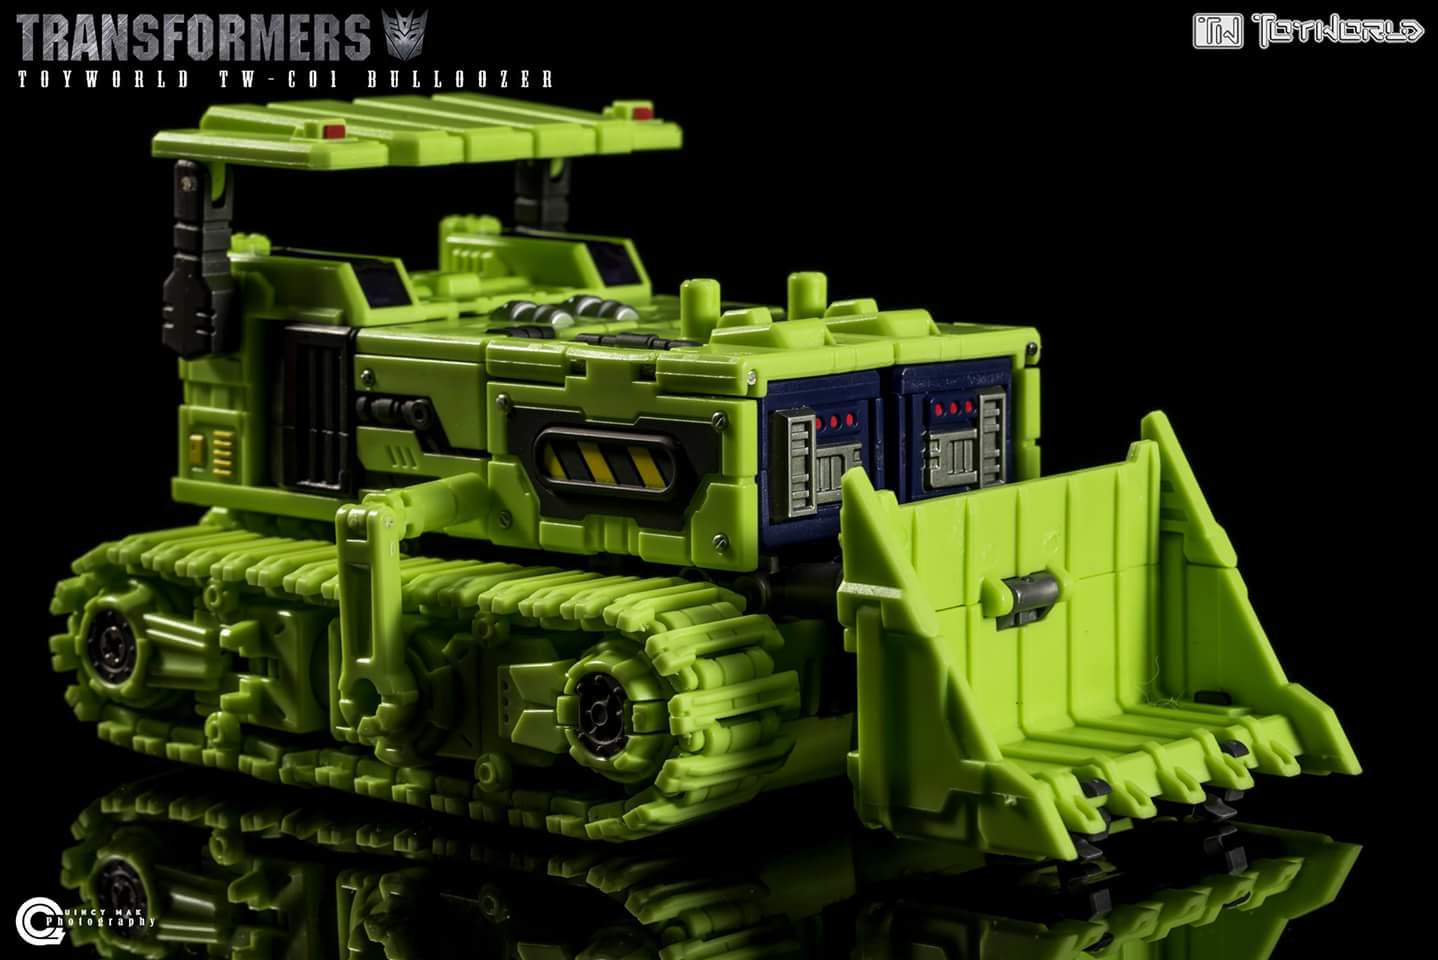 [Toyworld] Produit Tiers - Jouet TW-C Constructor aka Devastator/Dévastateur (Version vert G1 et jaune G2) - Page 4 9enrthRQ